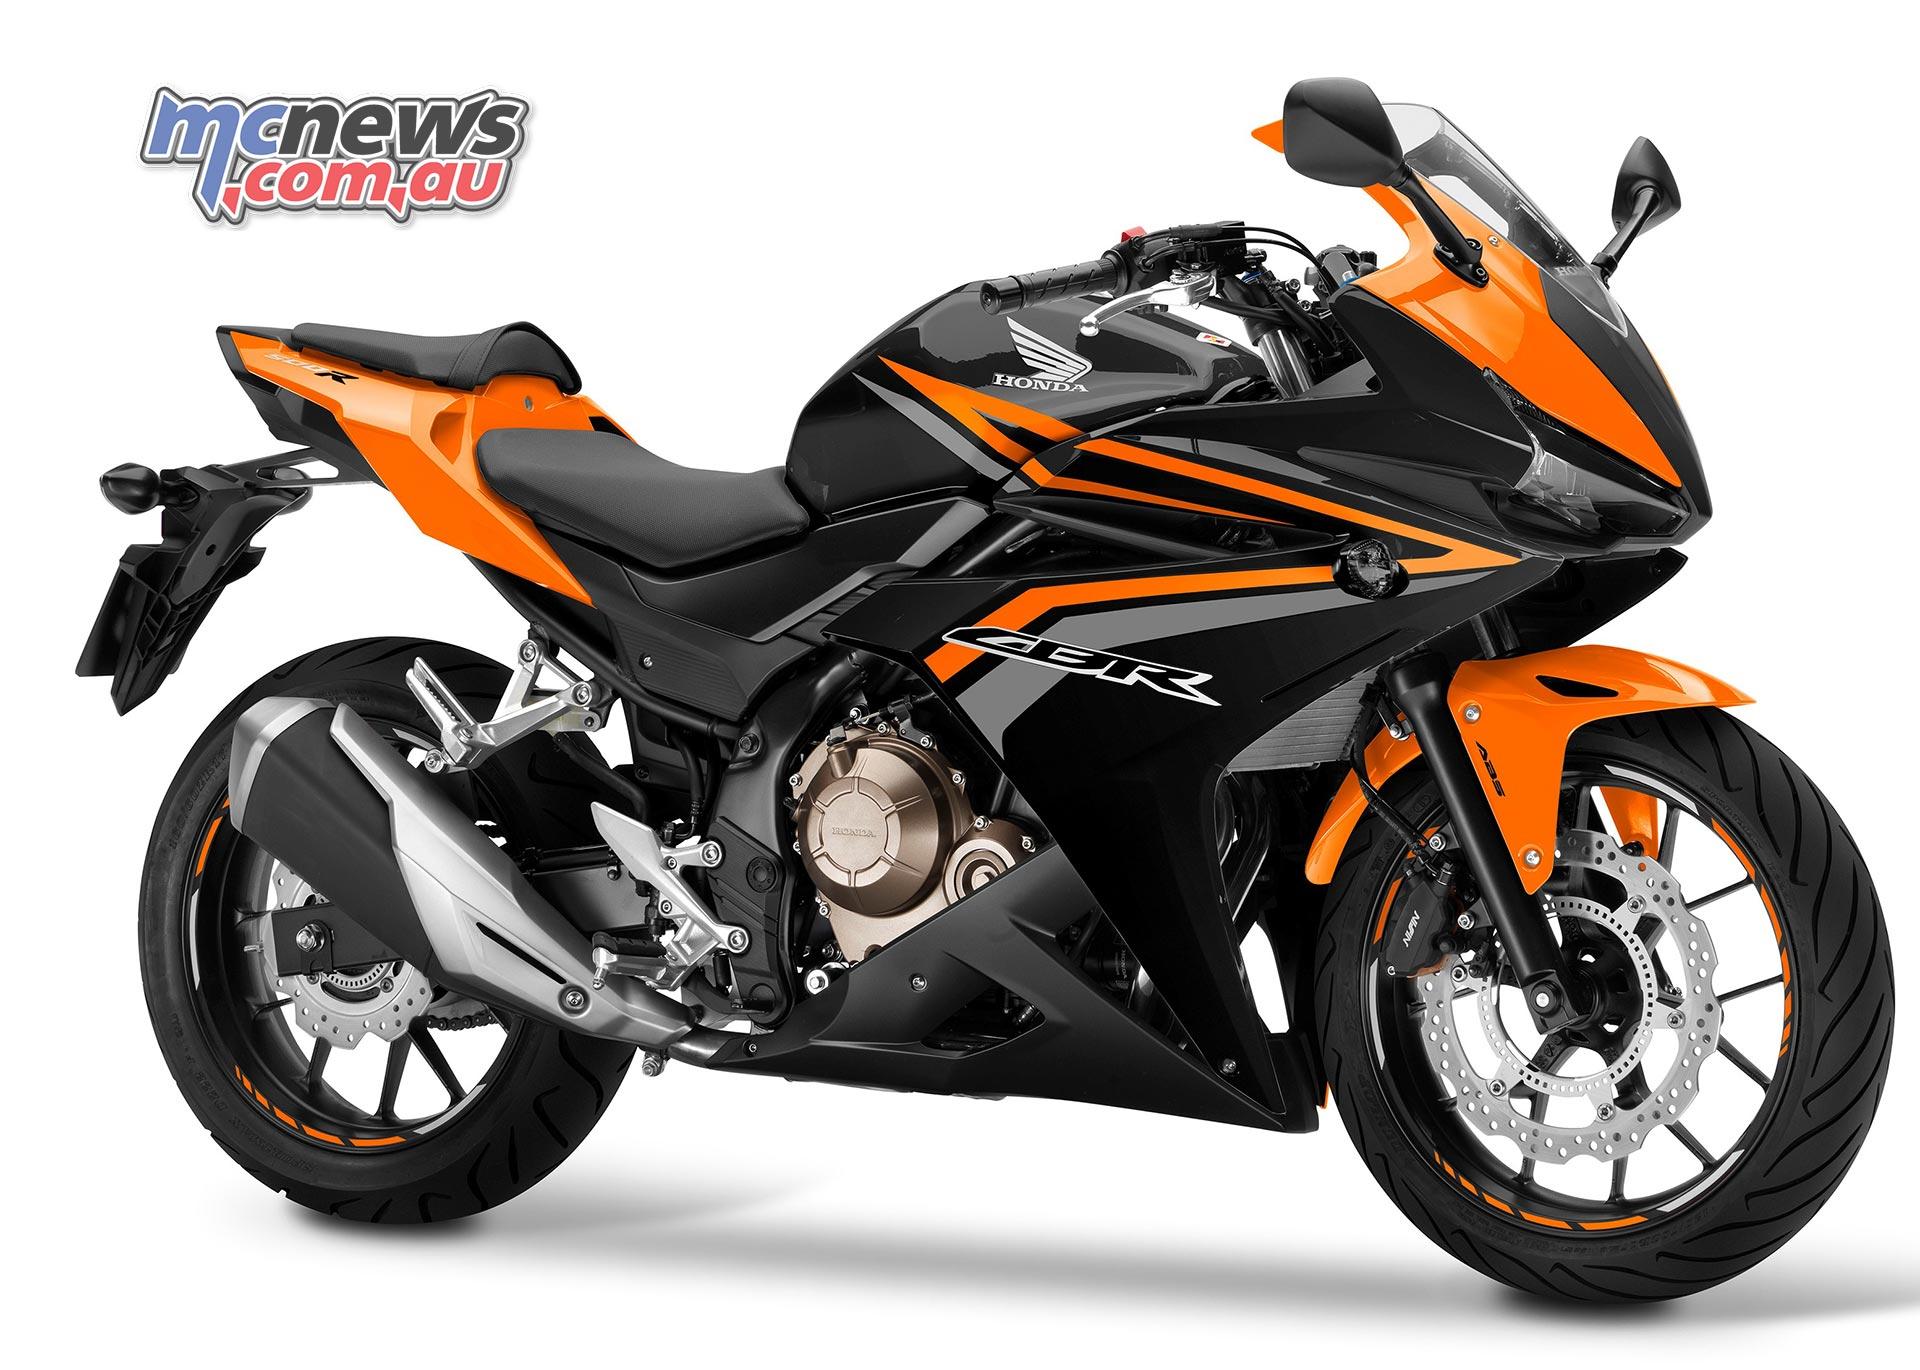 Honda CBR500R now $600 cheaper | Bargain at $7499 | MCNews ...